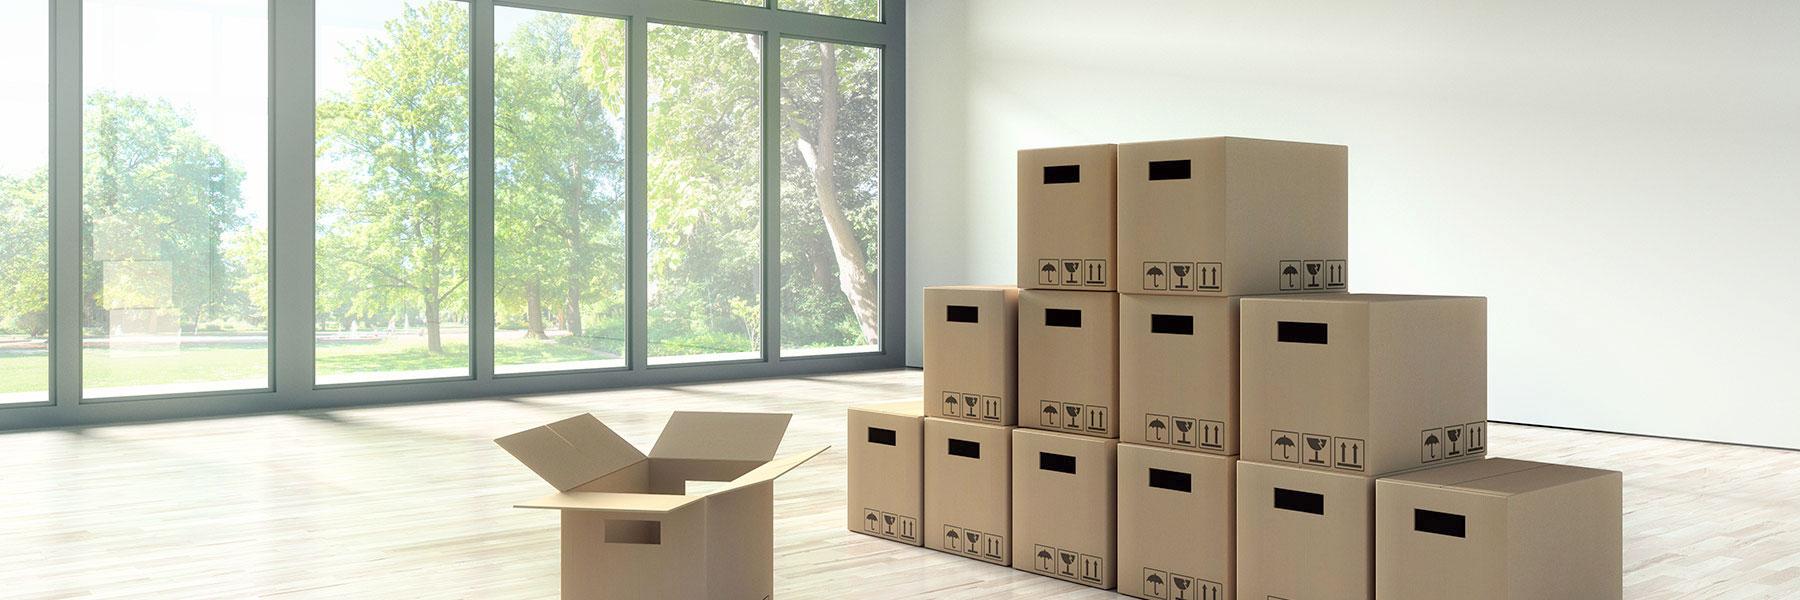 cmav-office-house-removal